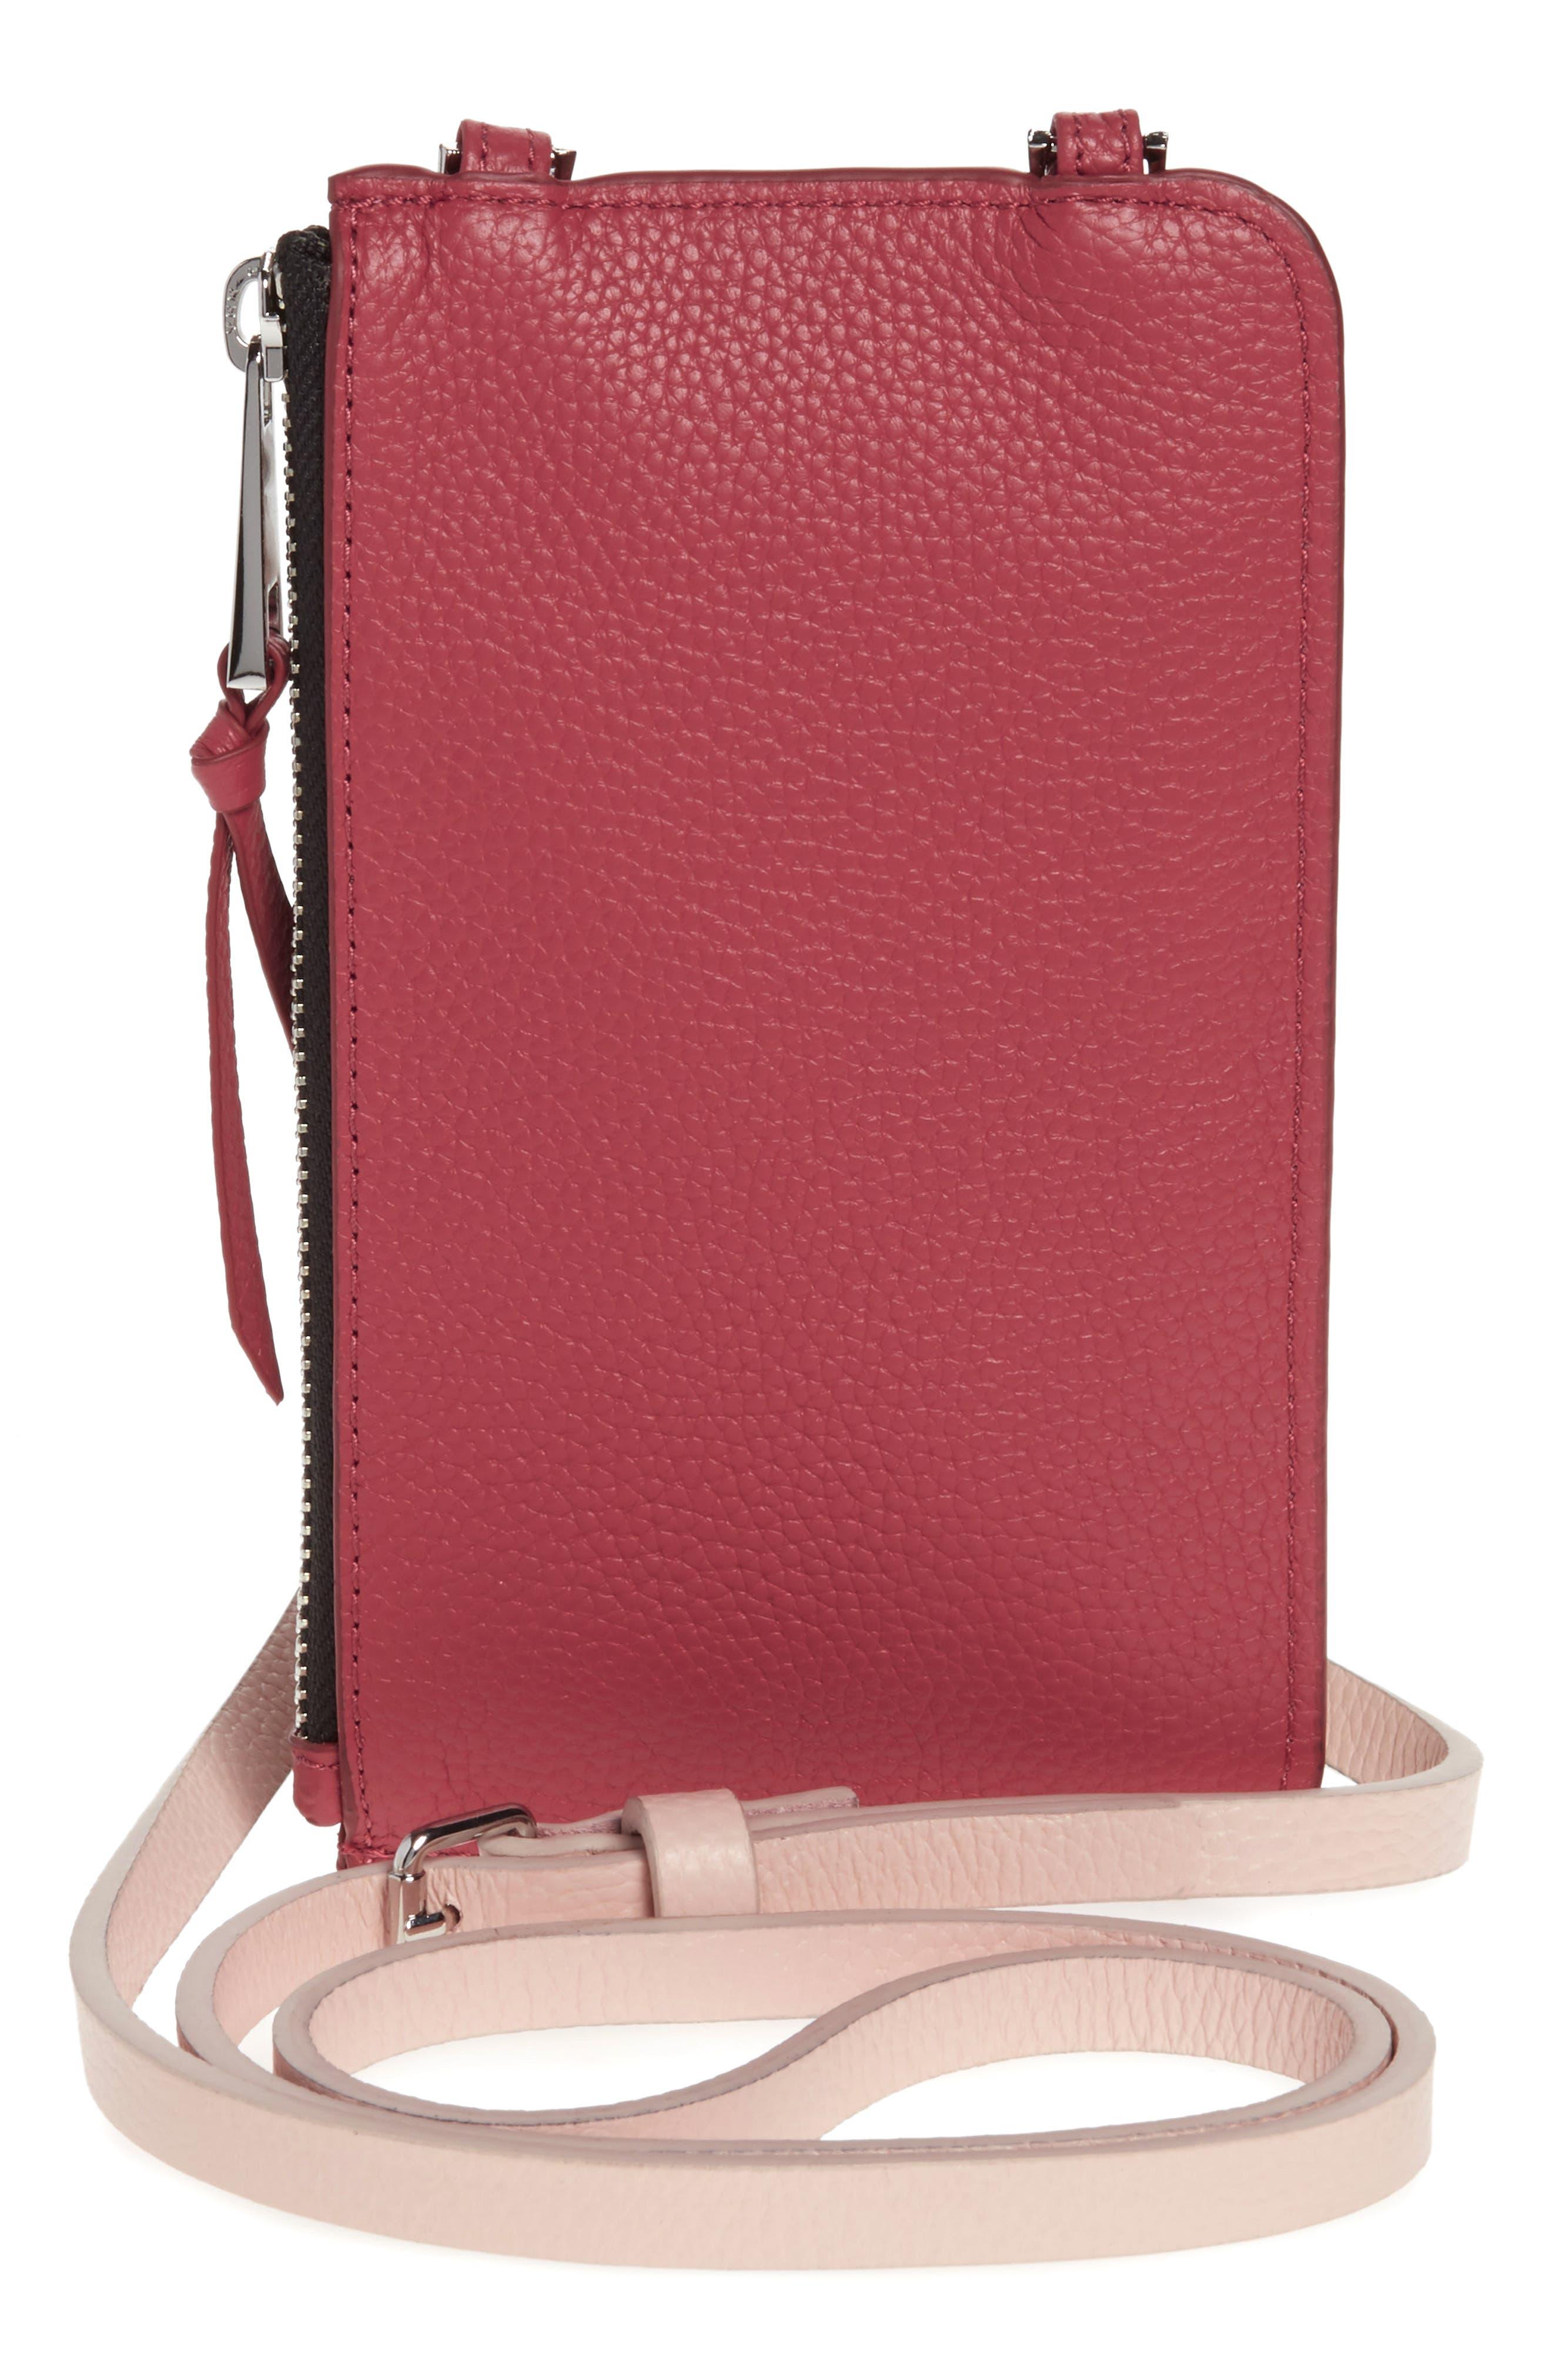 BANDOLIER,                             Emma Leather iPhone X/Xs Crossbody Case,                             Alternate thumbnail 5, color,                             PINK/ MAUVE